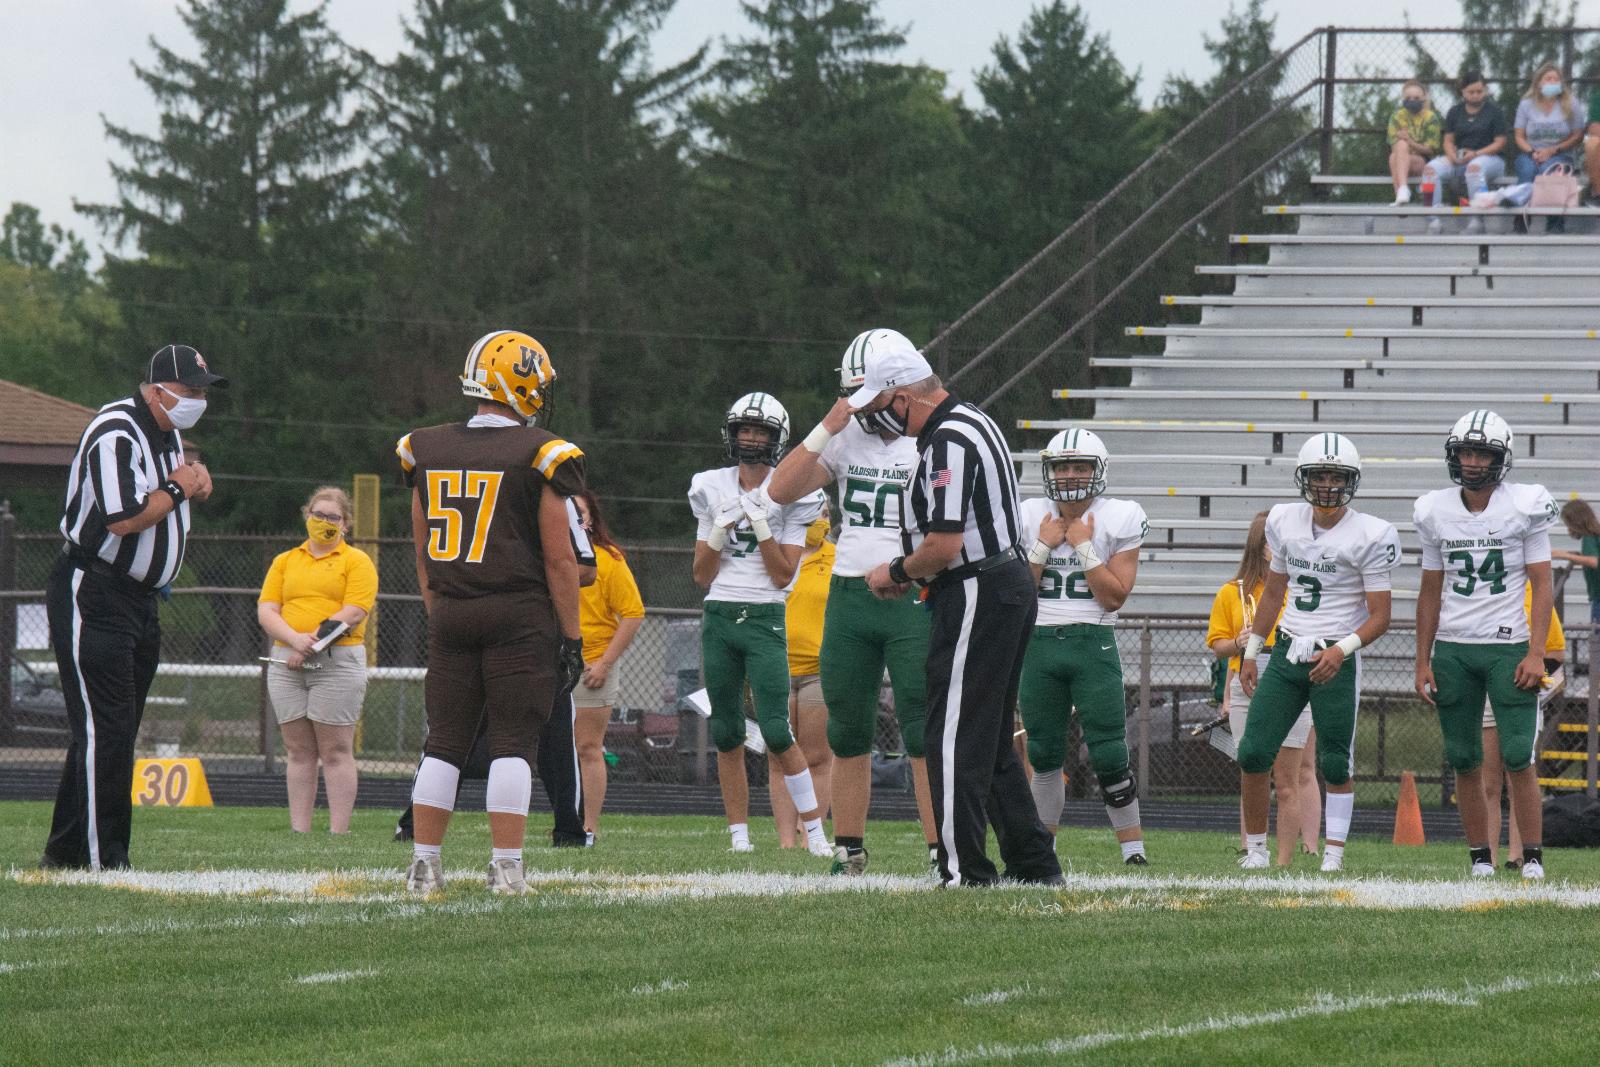 HS Football: WJ vs Madison Plains 8-28-20